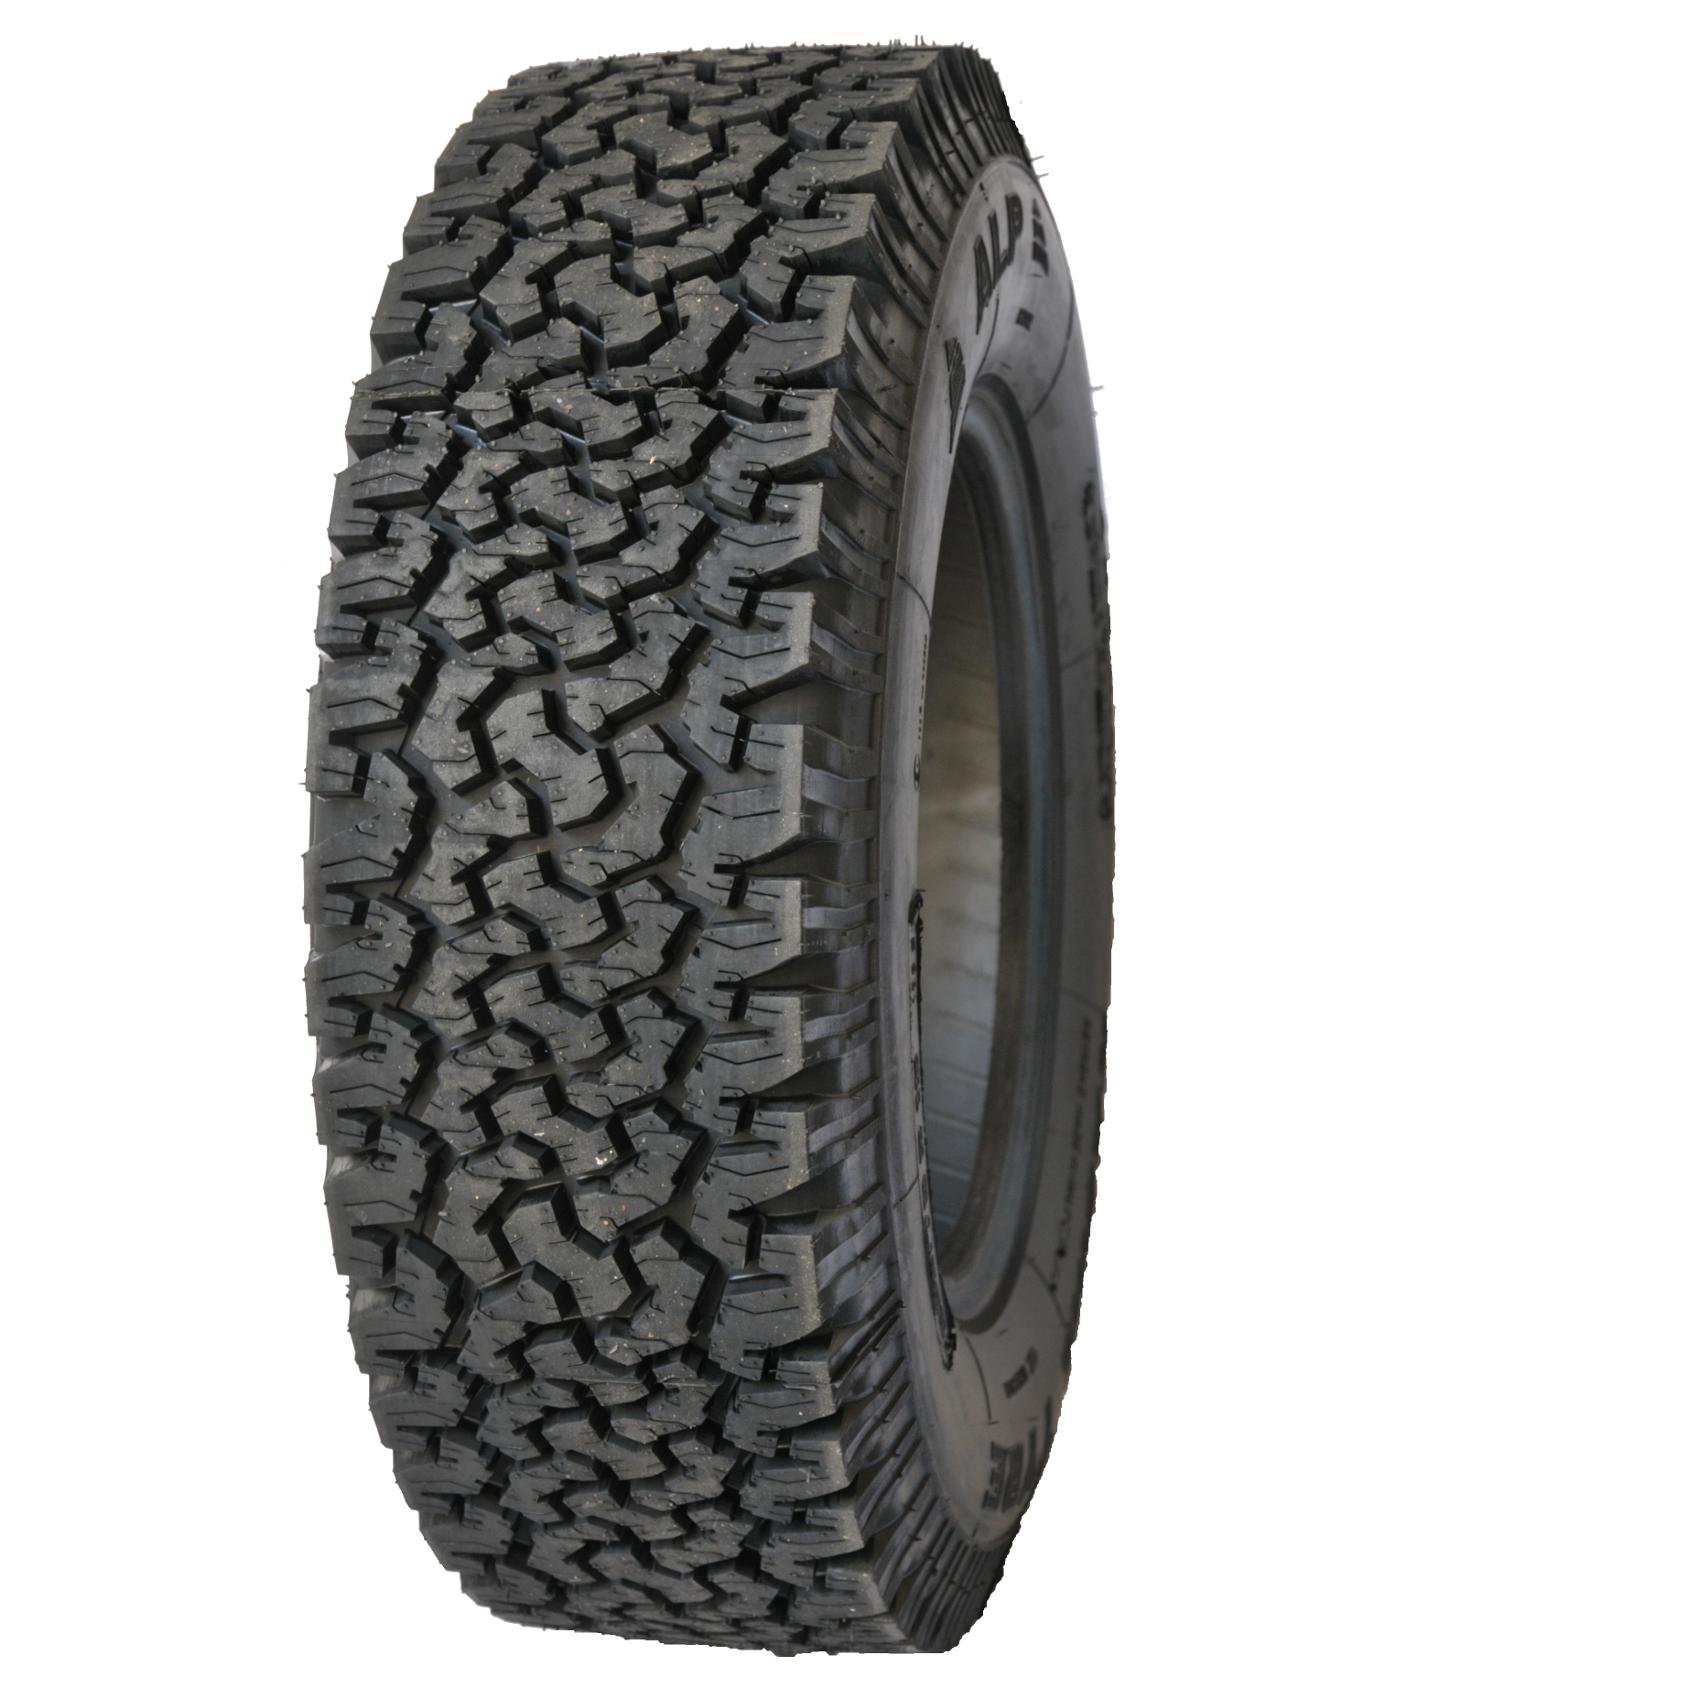 off road tire bfg 235 60 r16 italian company pneus ovada. Black Bedroom Furniture Sets. Home Design Ideas